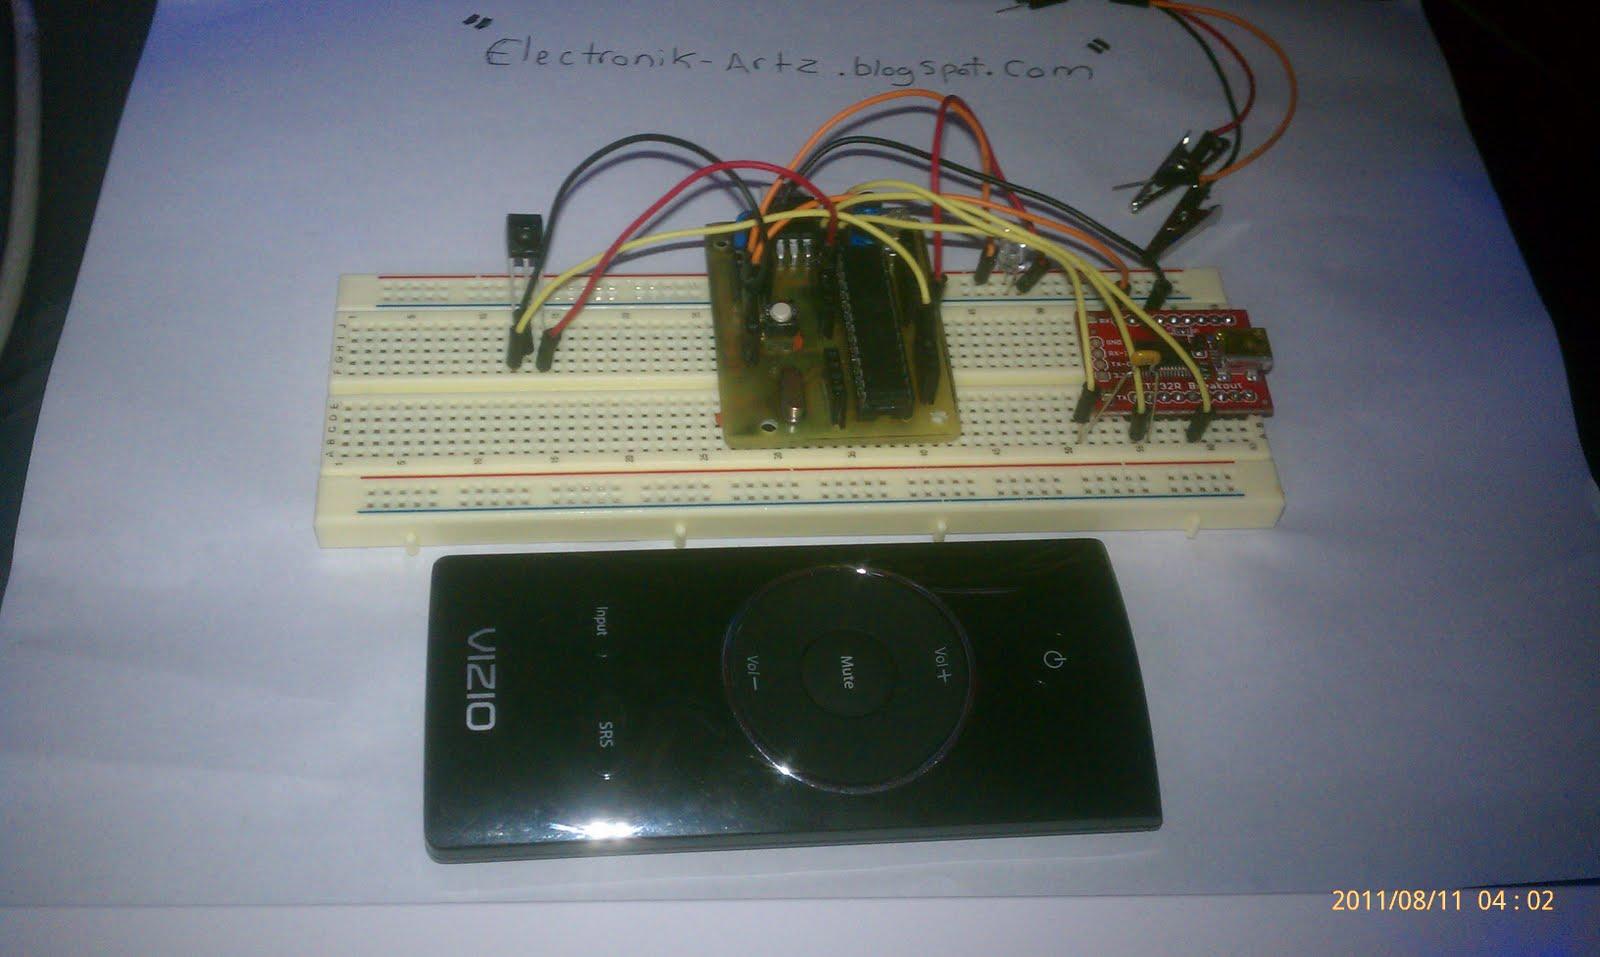 Electronik Artz: Arduino + IR Detector = PC Remote